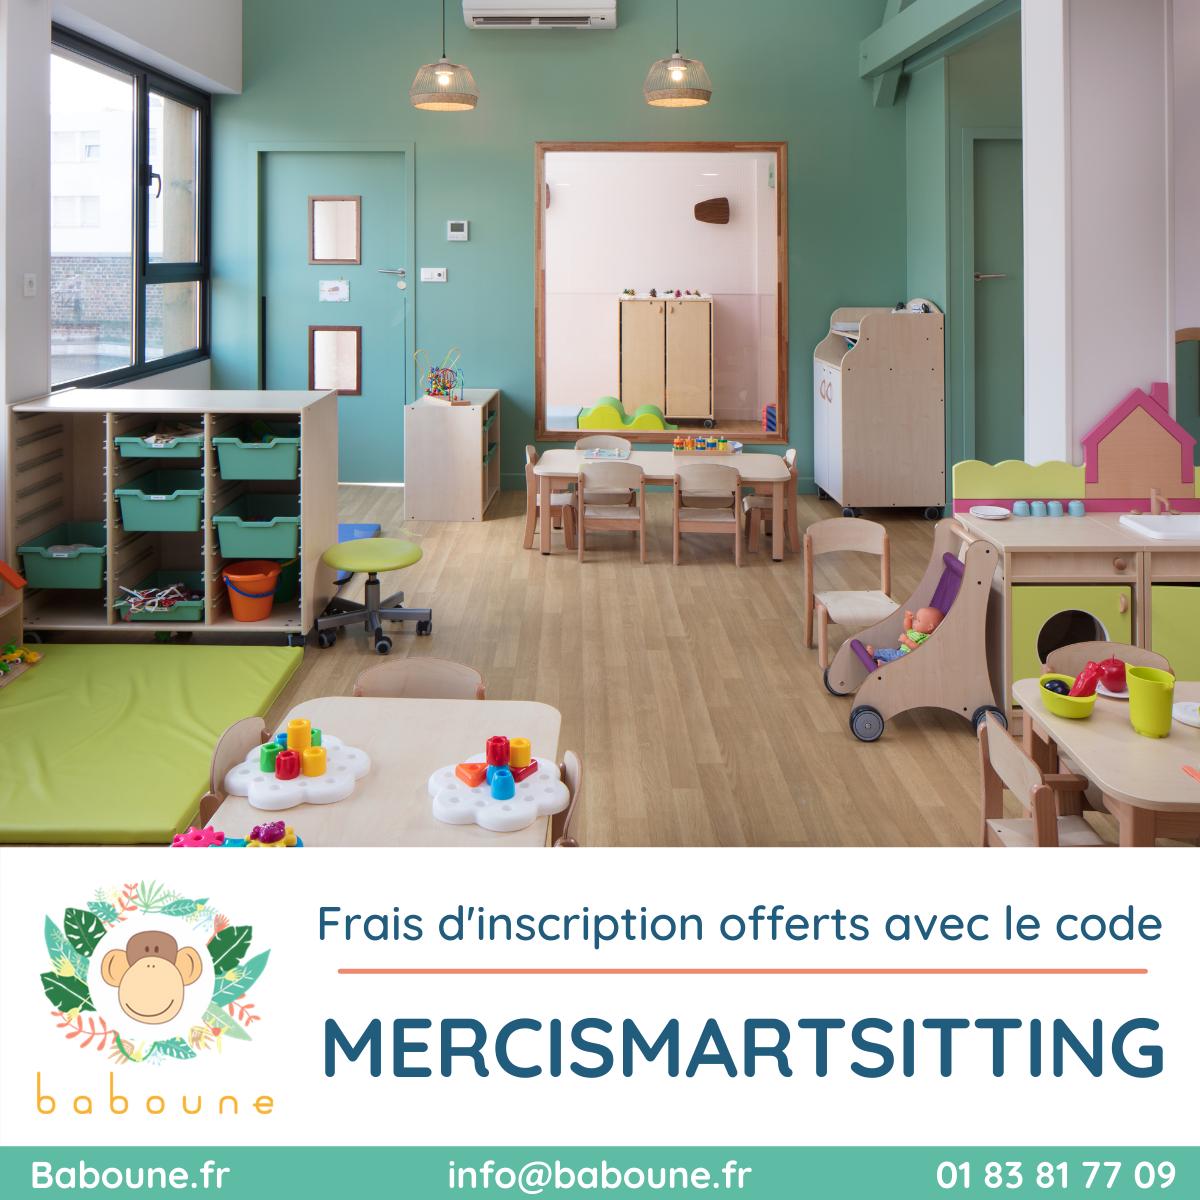 Partenariat Baboune / Le Smartsitting